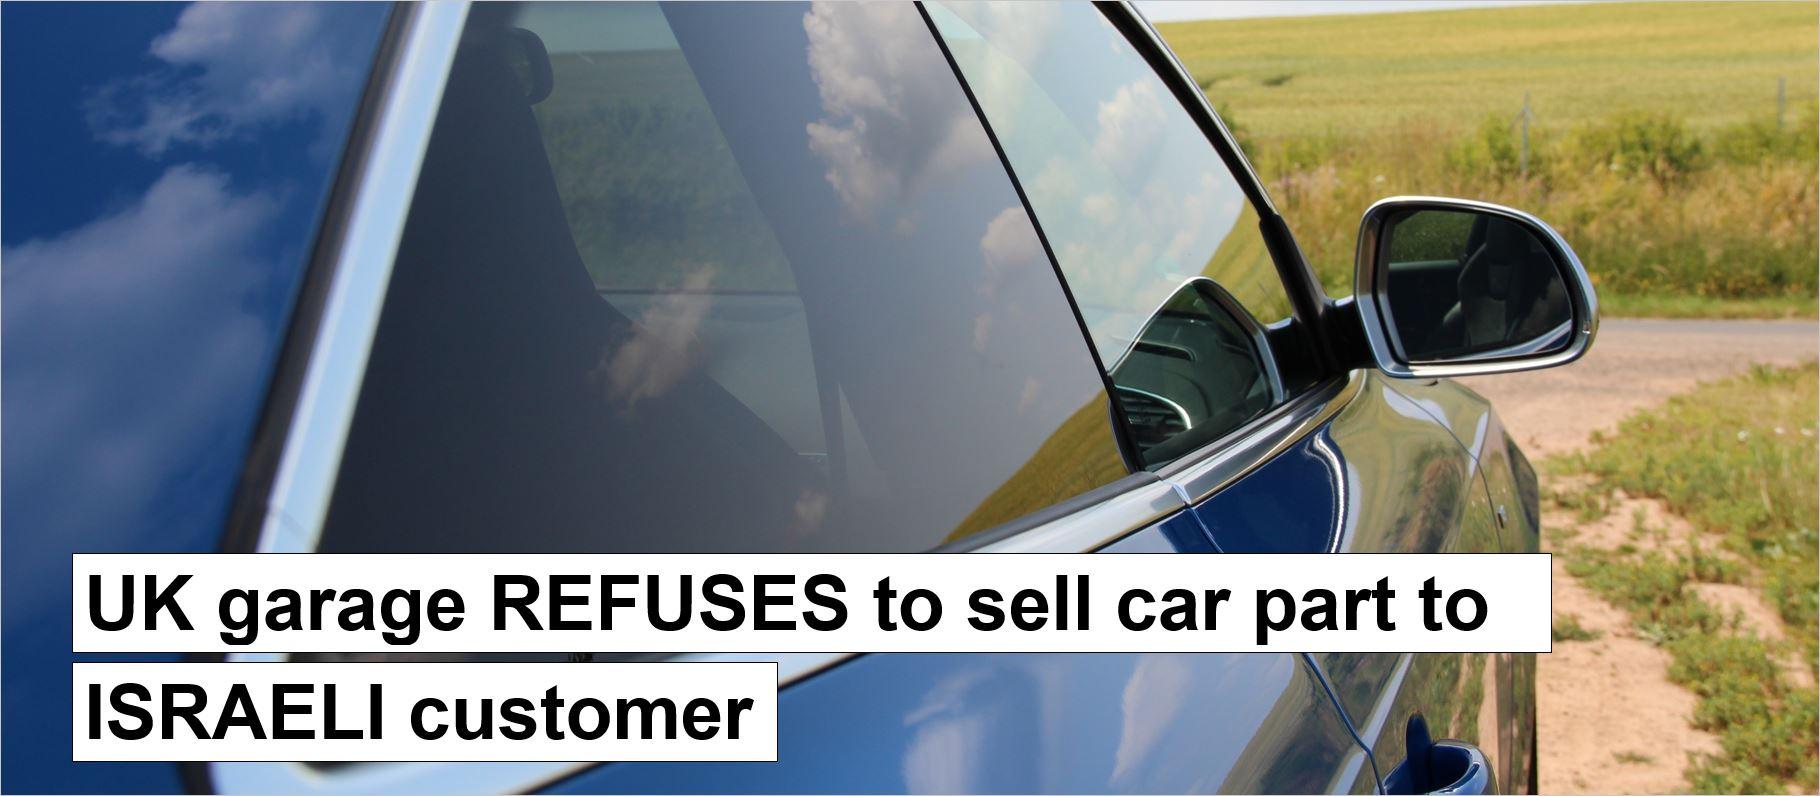 UK garage REFUSES to sell car part to Israeli customer